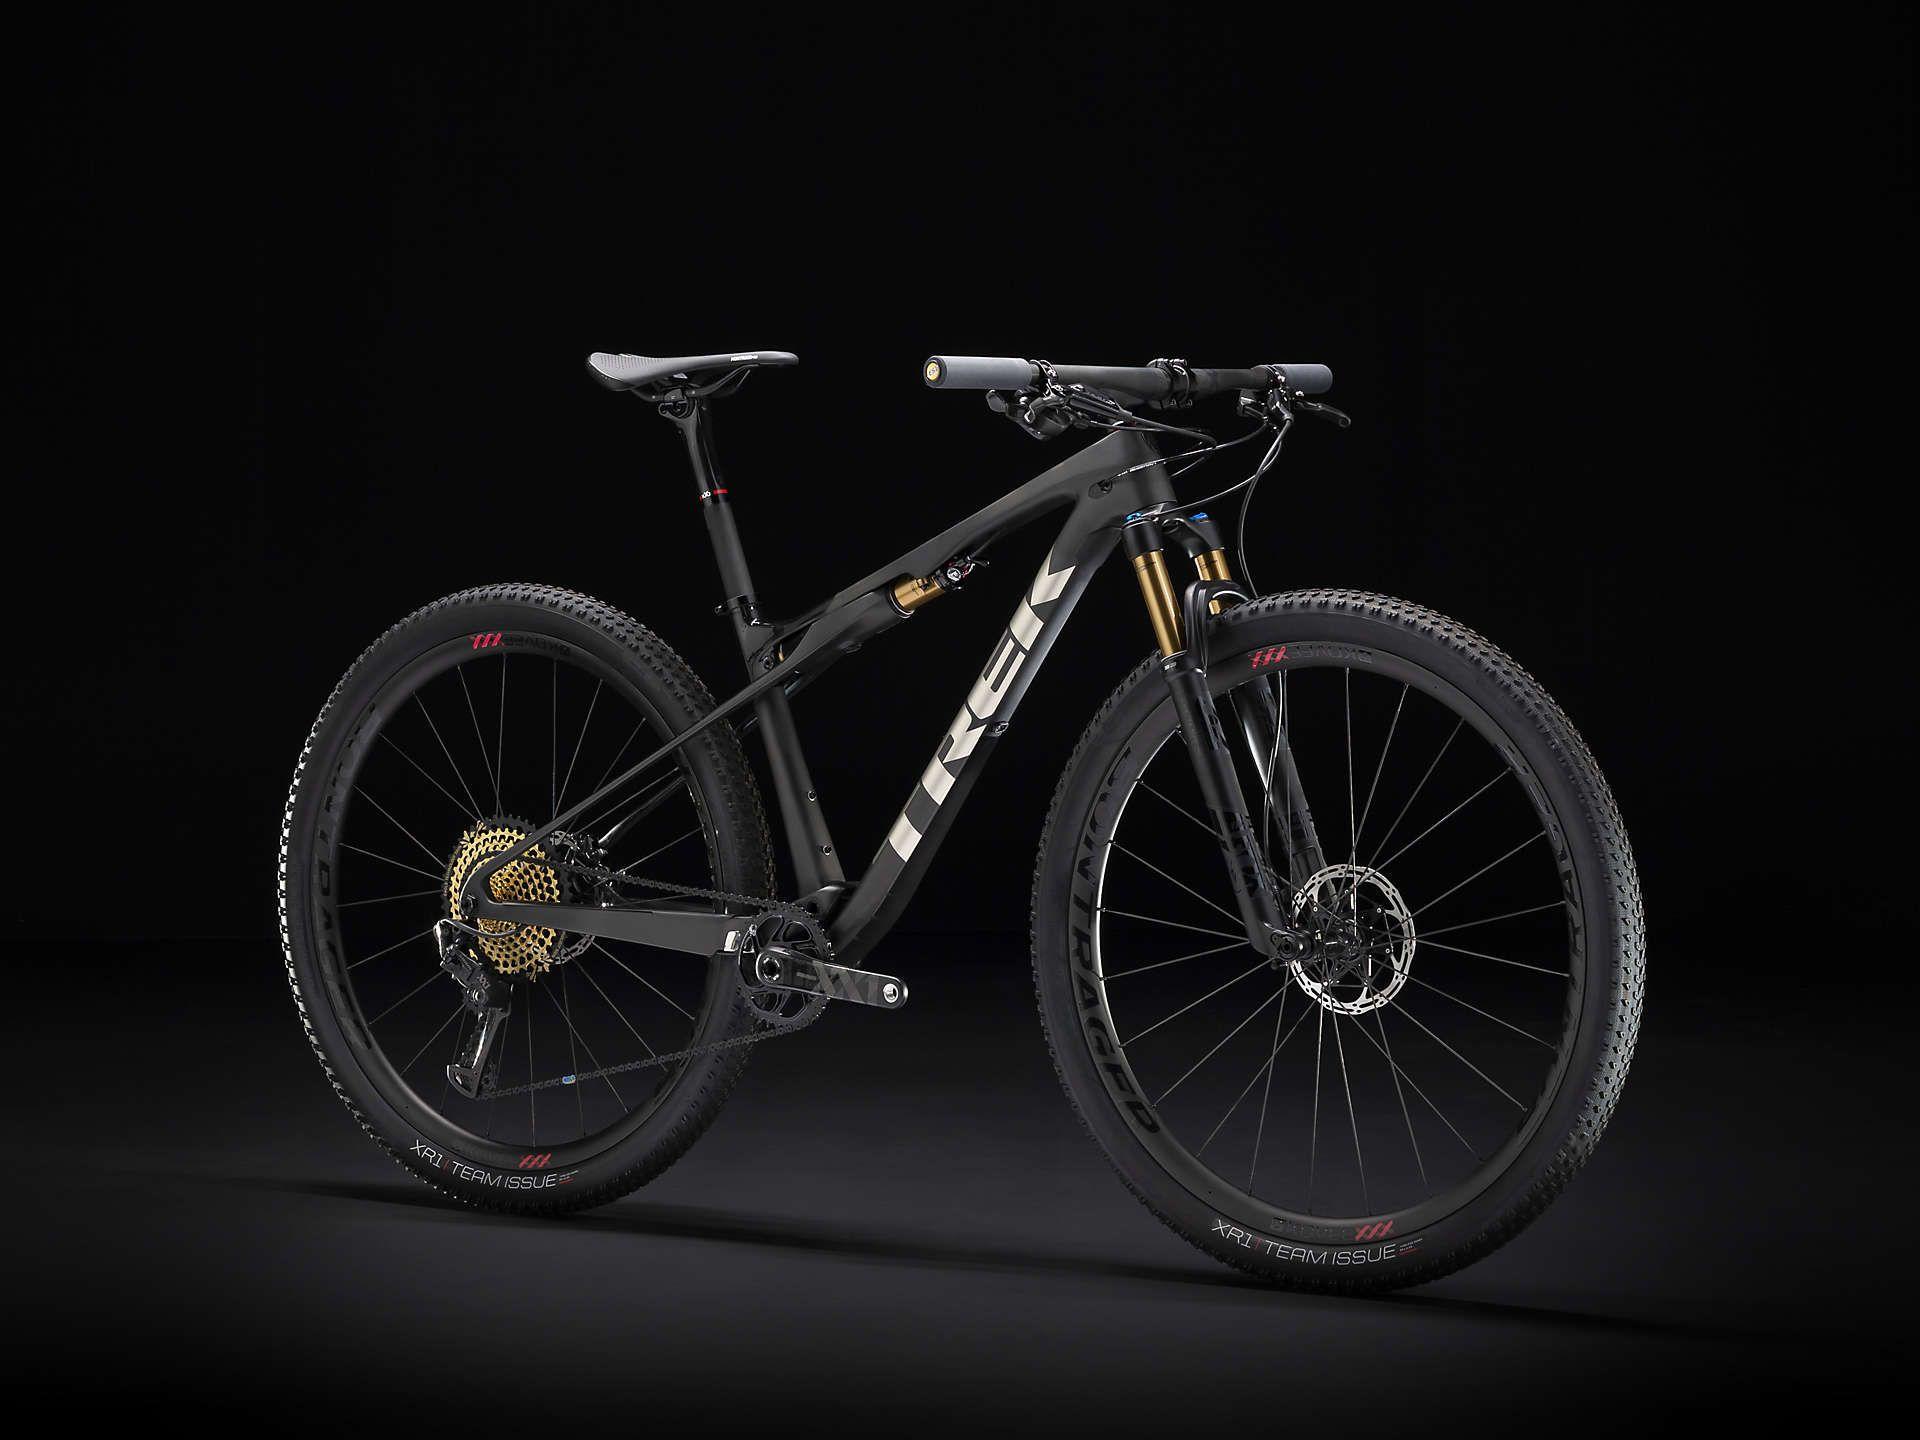 Supercaliber 9 9 Trek Bikes Za Trek Bikes Trek Mountain Bike Cross Country Bike